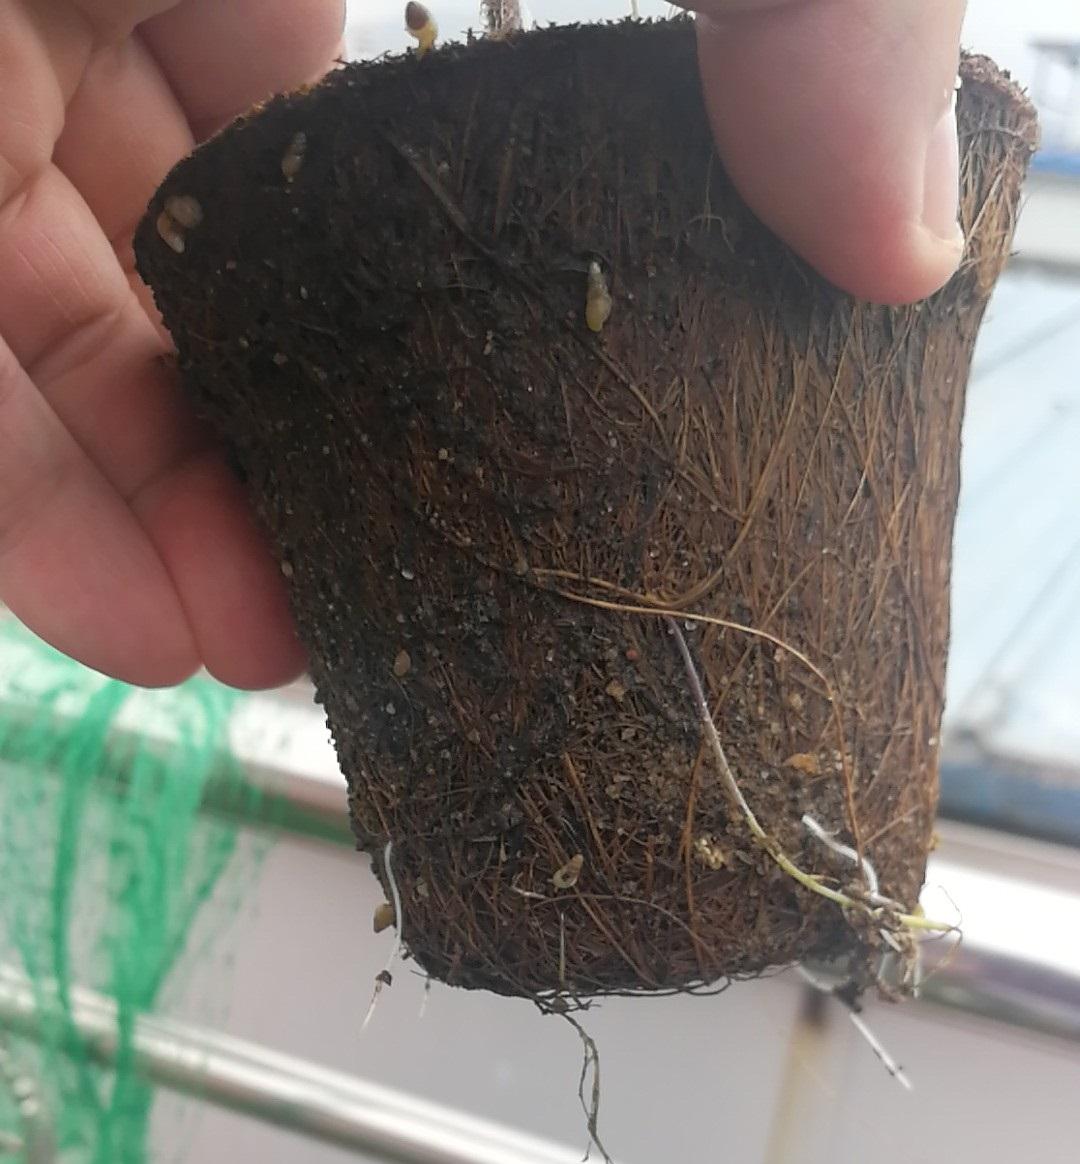 hydroponics pots